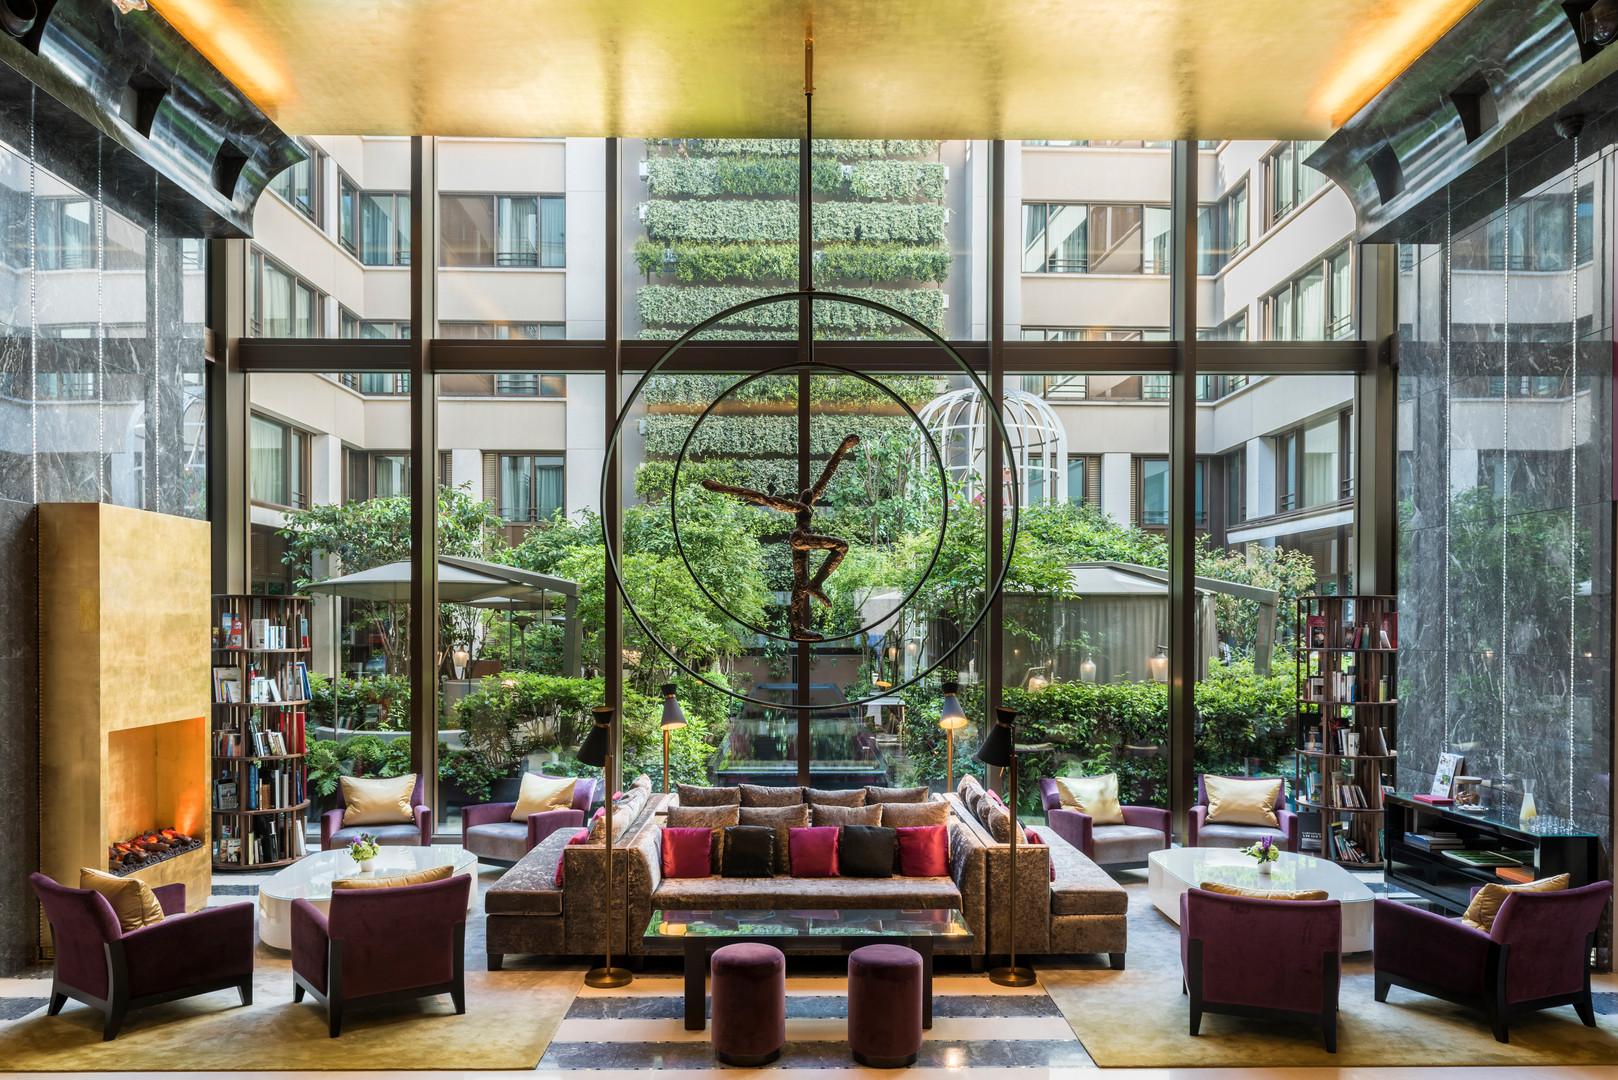 Mandarin Oriental Paris - Le lobby00001.